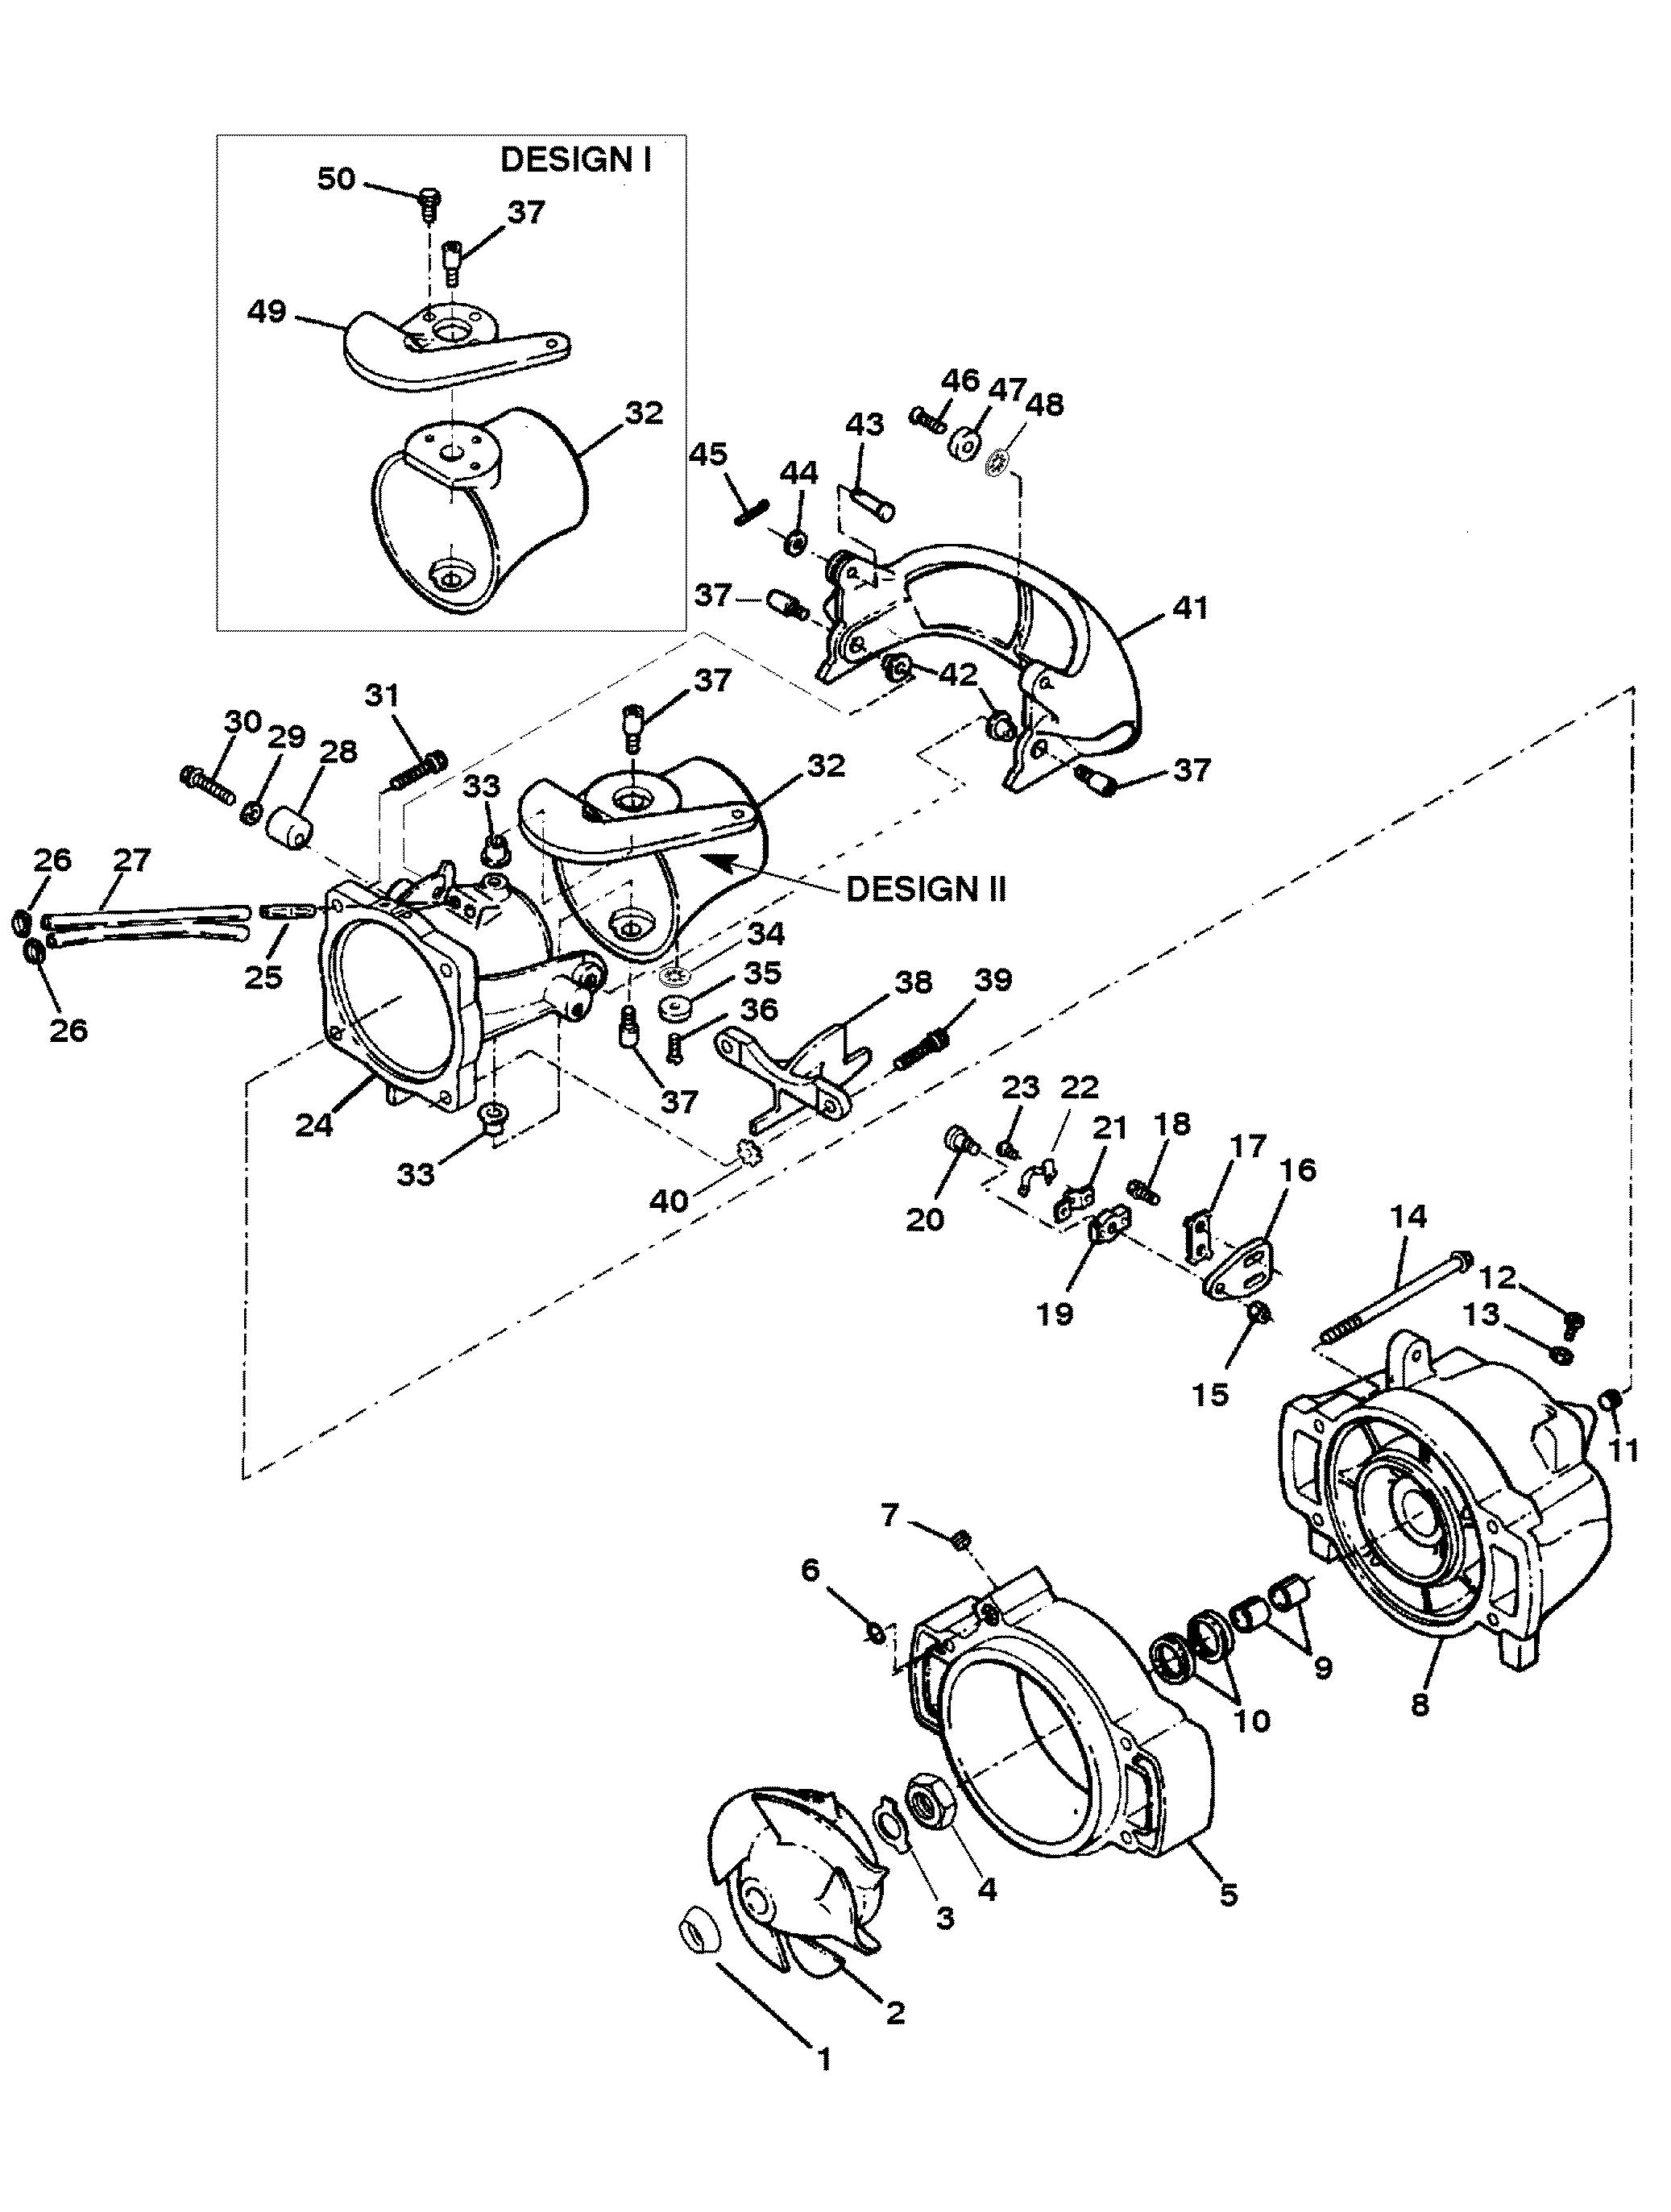 Каталог запчастей SPORTJET 120XR (JET DRIVE) 1997 0E151580